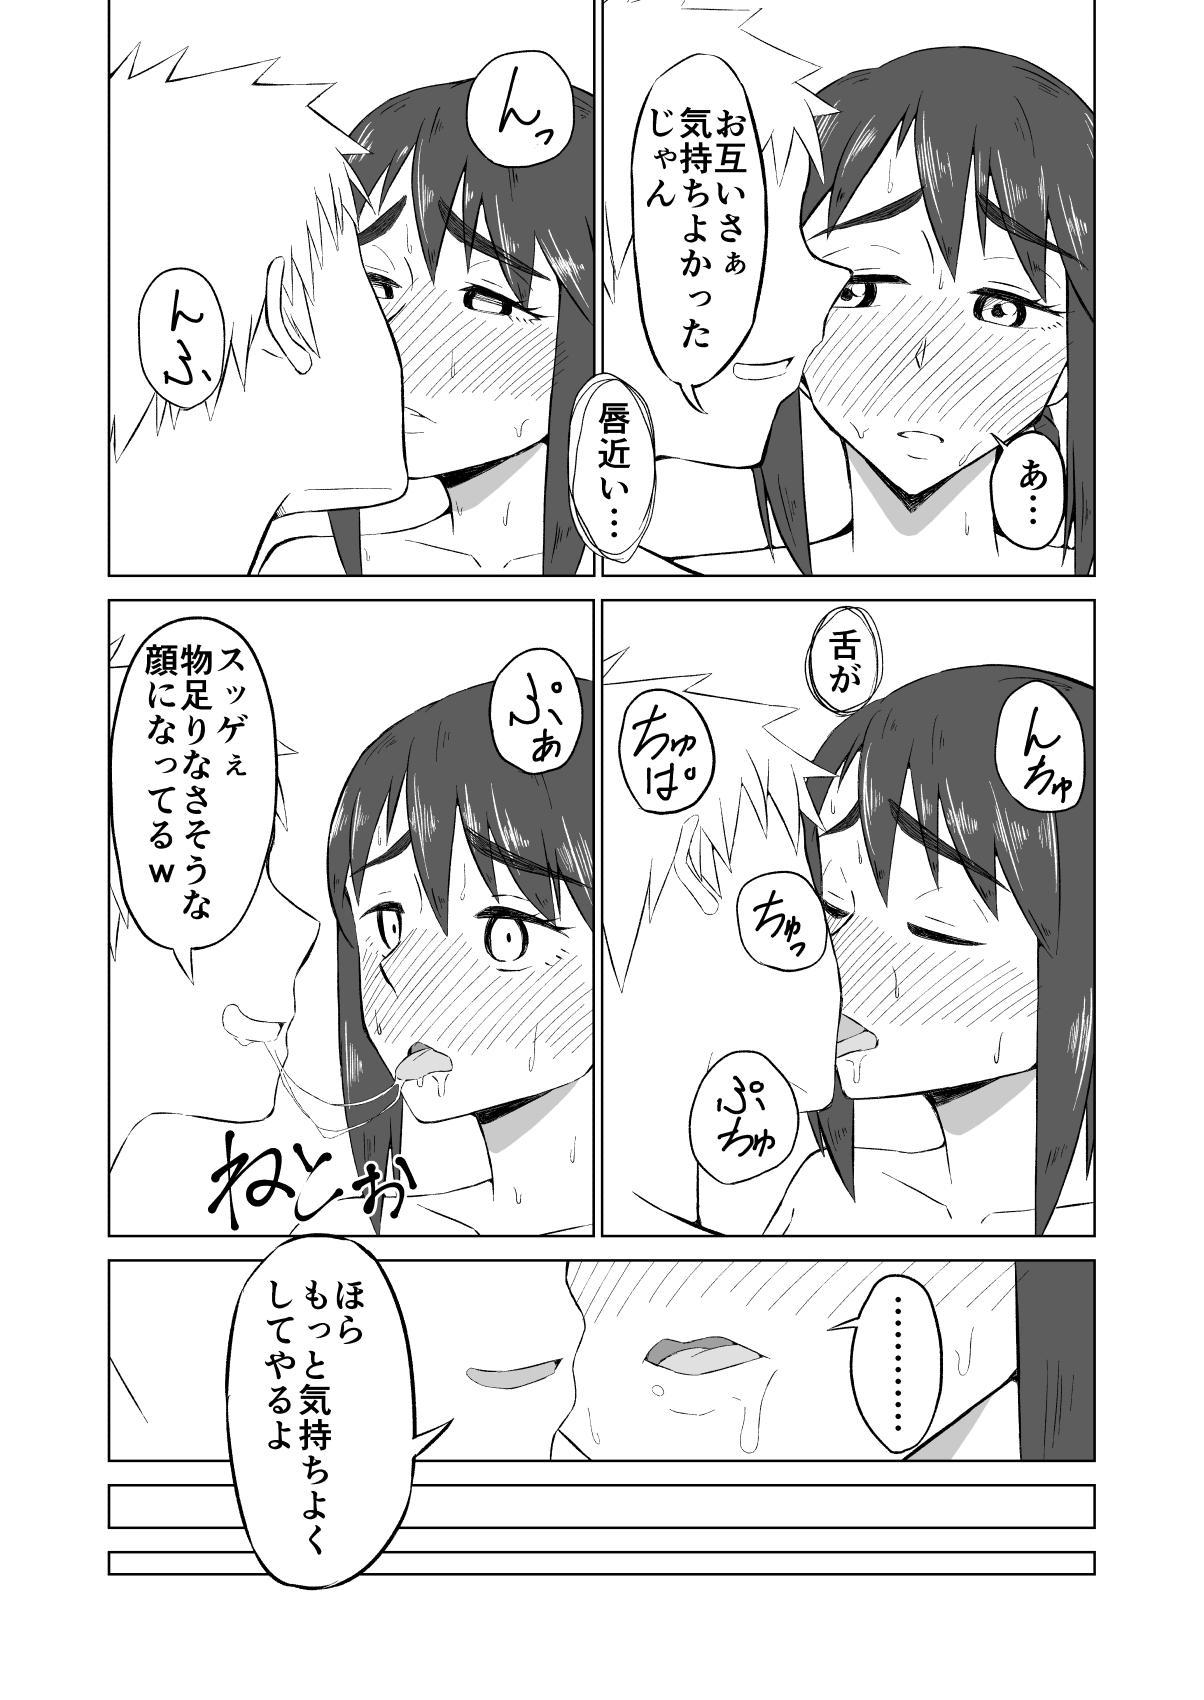 Hitozuma ga Off-kai de Omochikaerare Hon 14